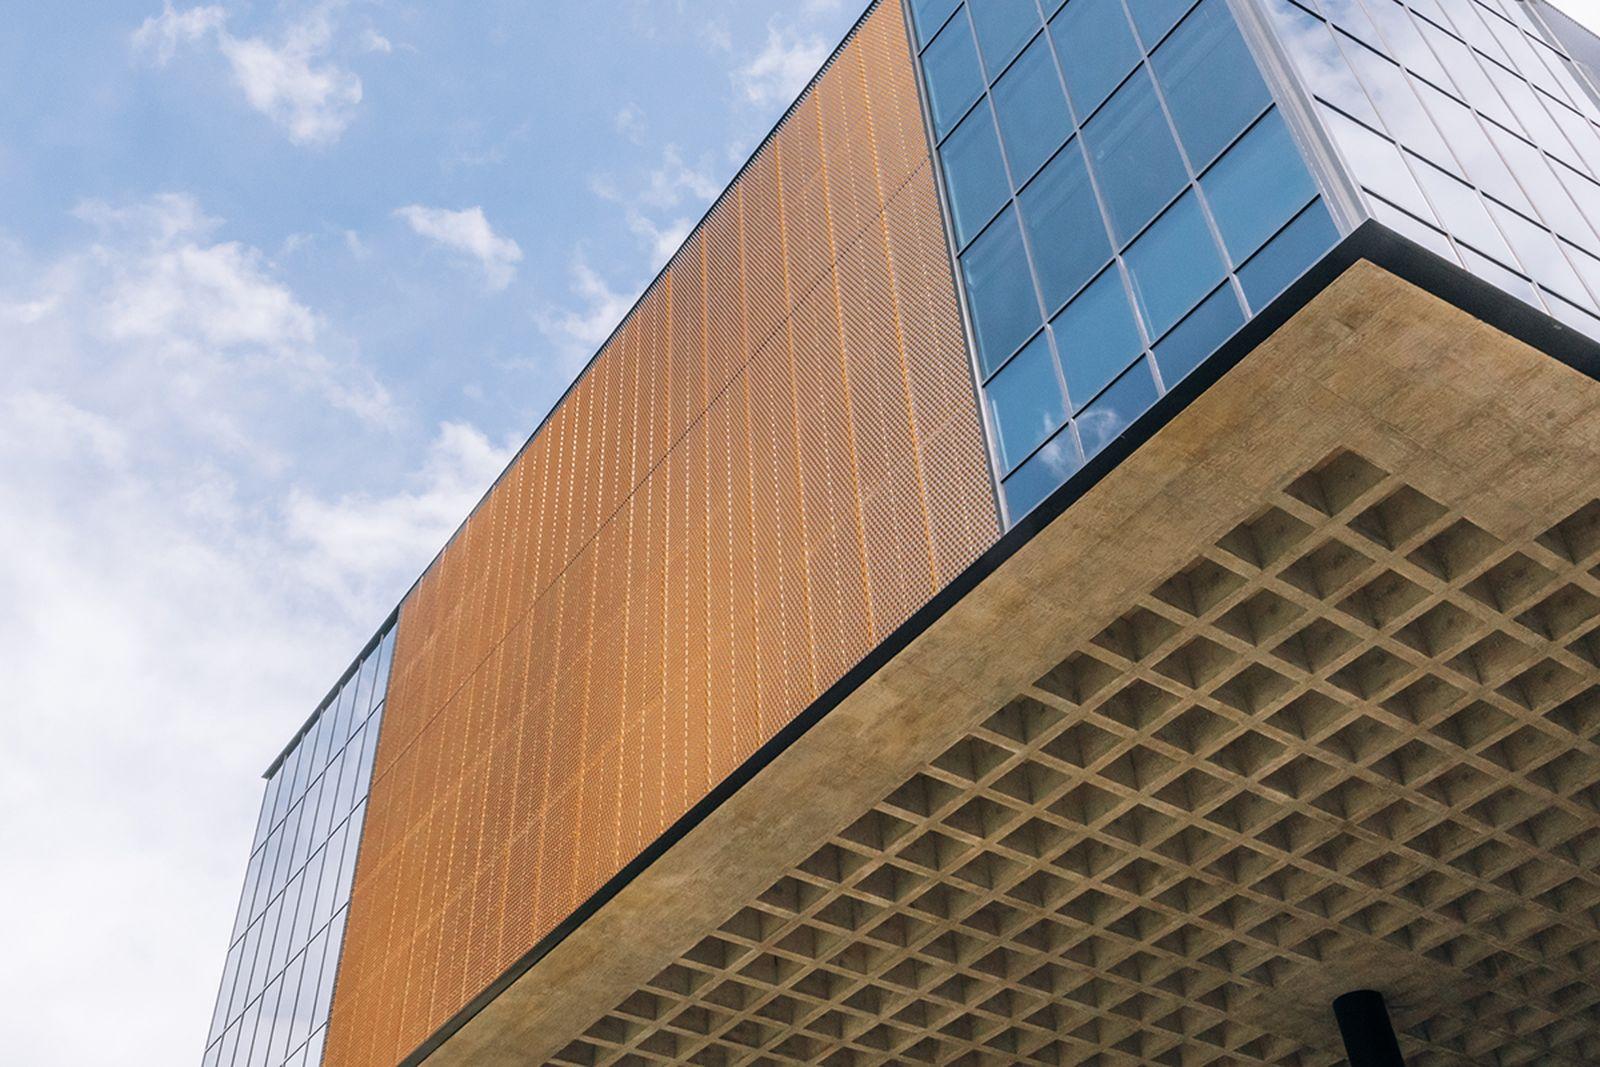 nike-lebron-james-innovation-center- (4)